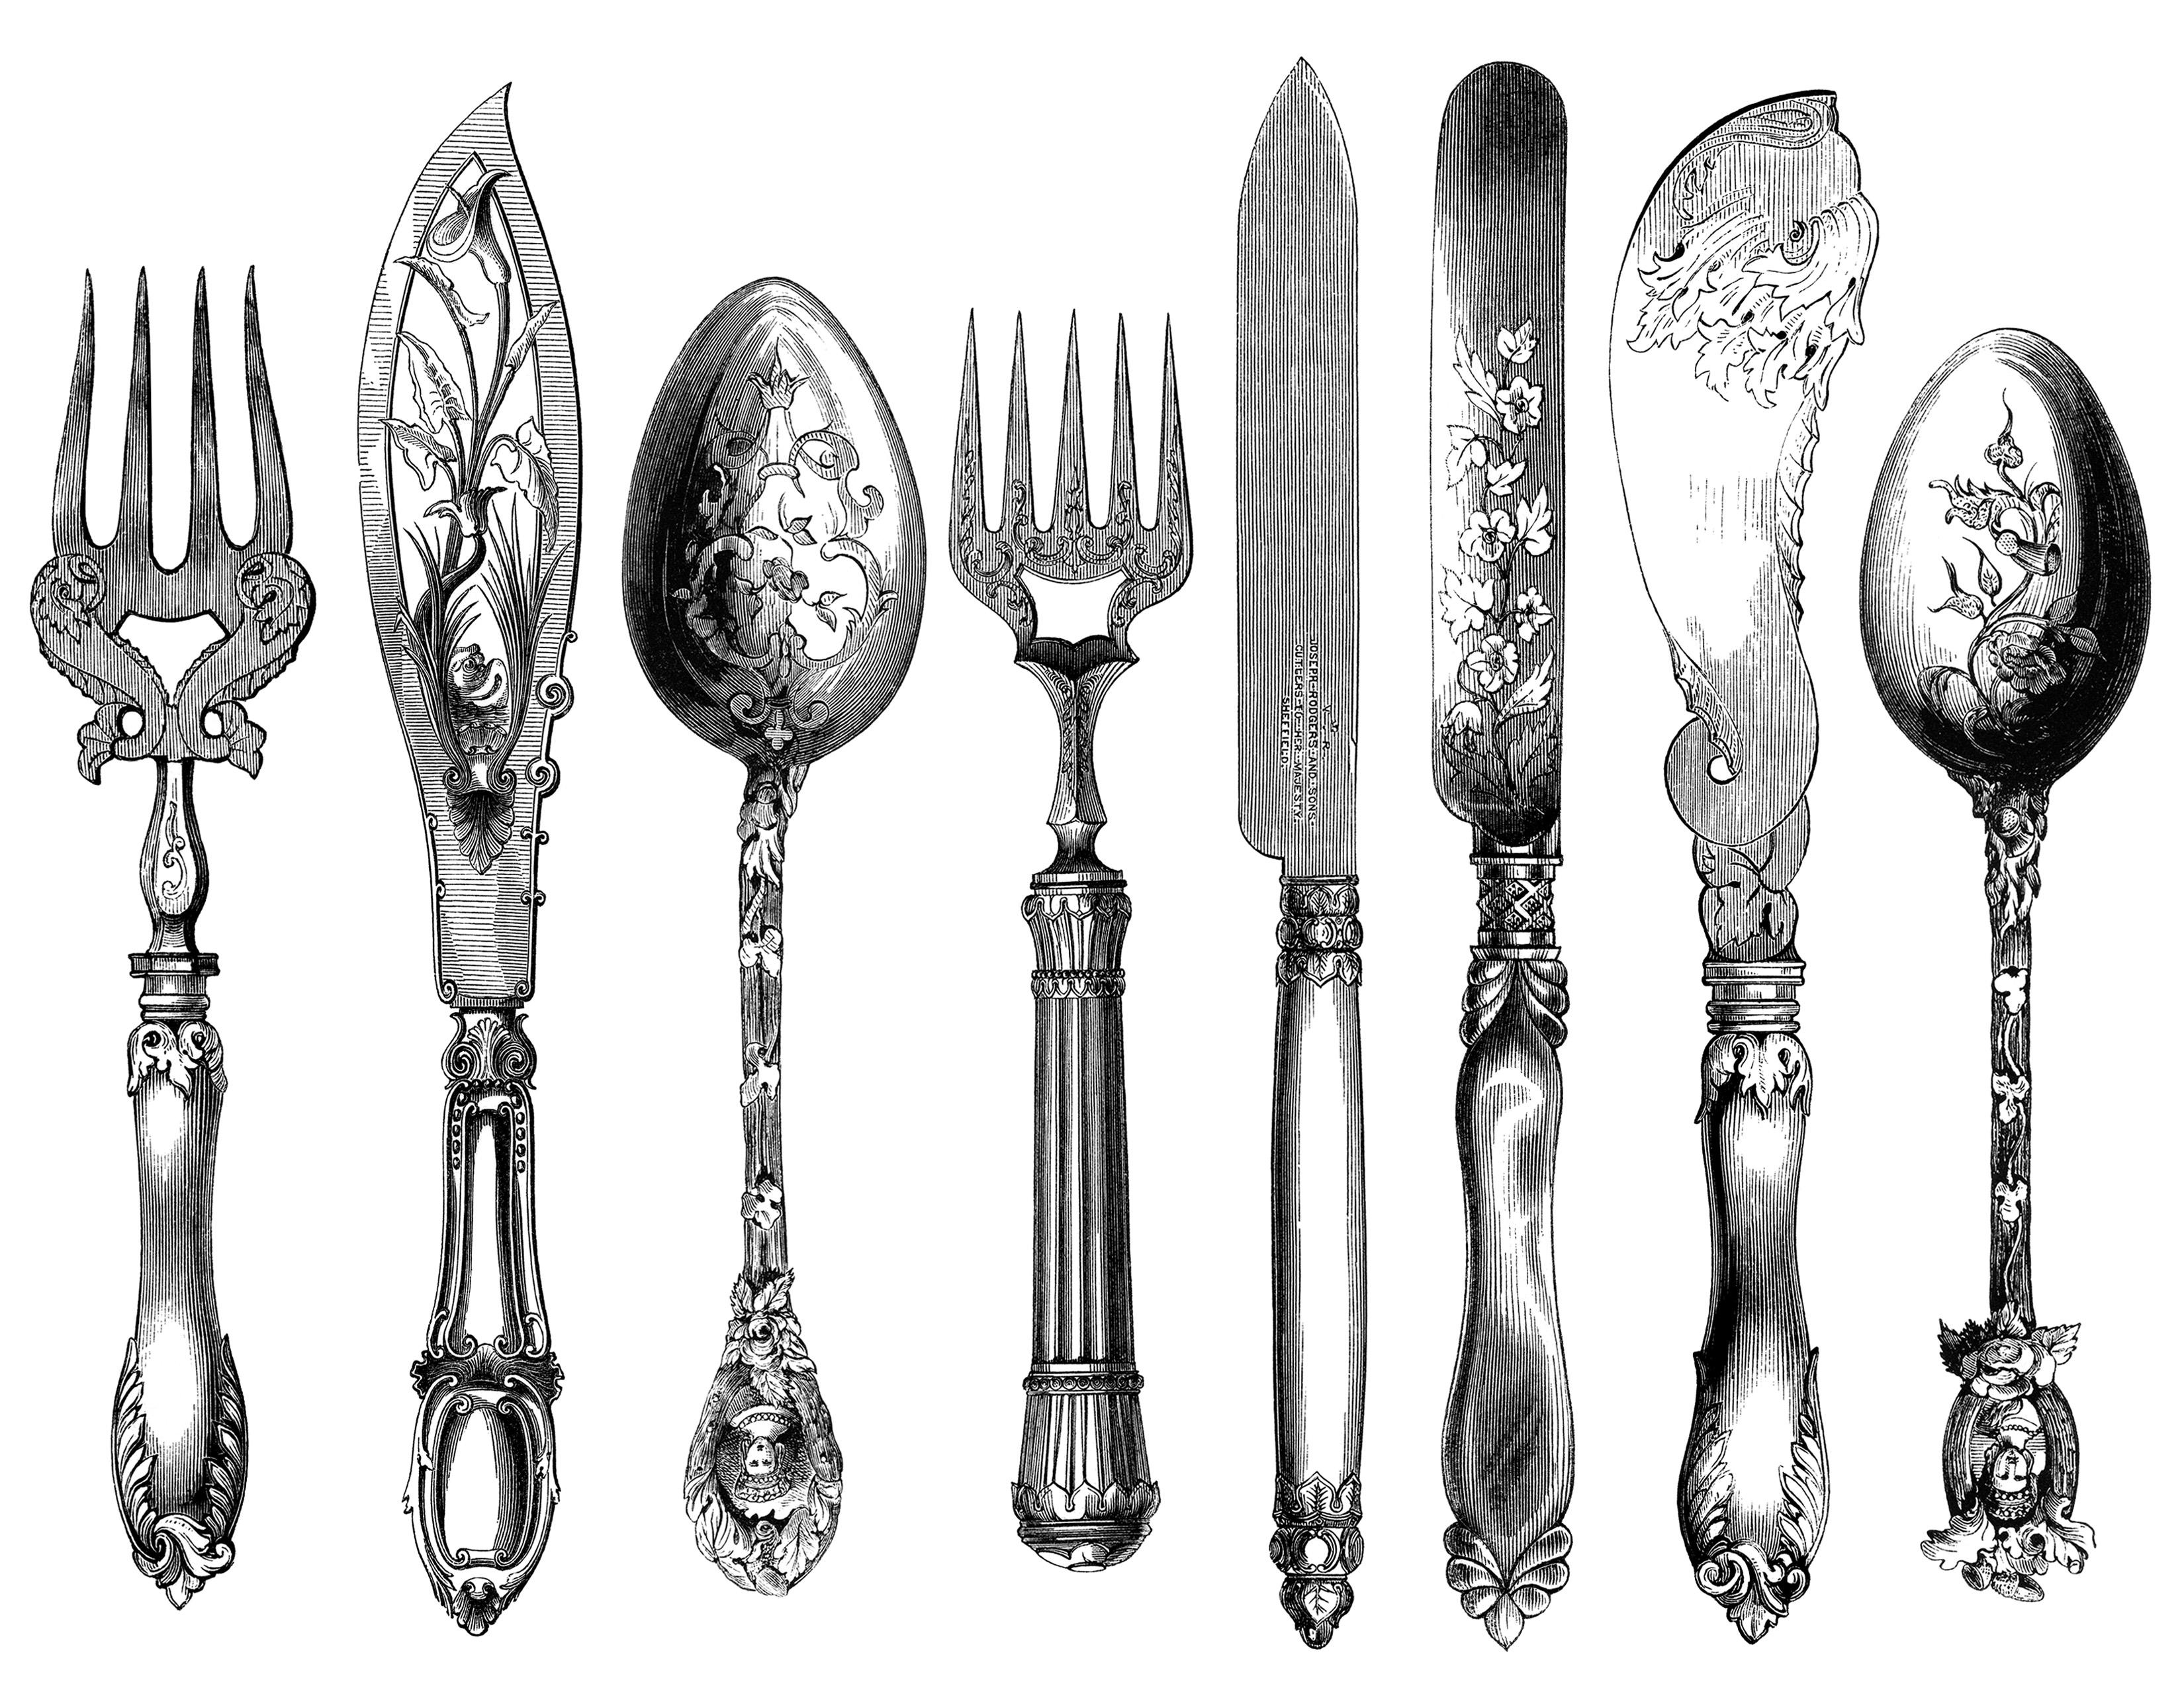 Antique Cutlery Engravings Set 2 Free Clip Art